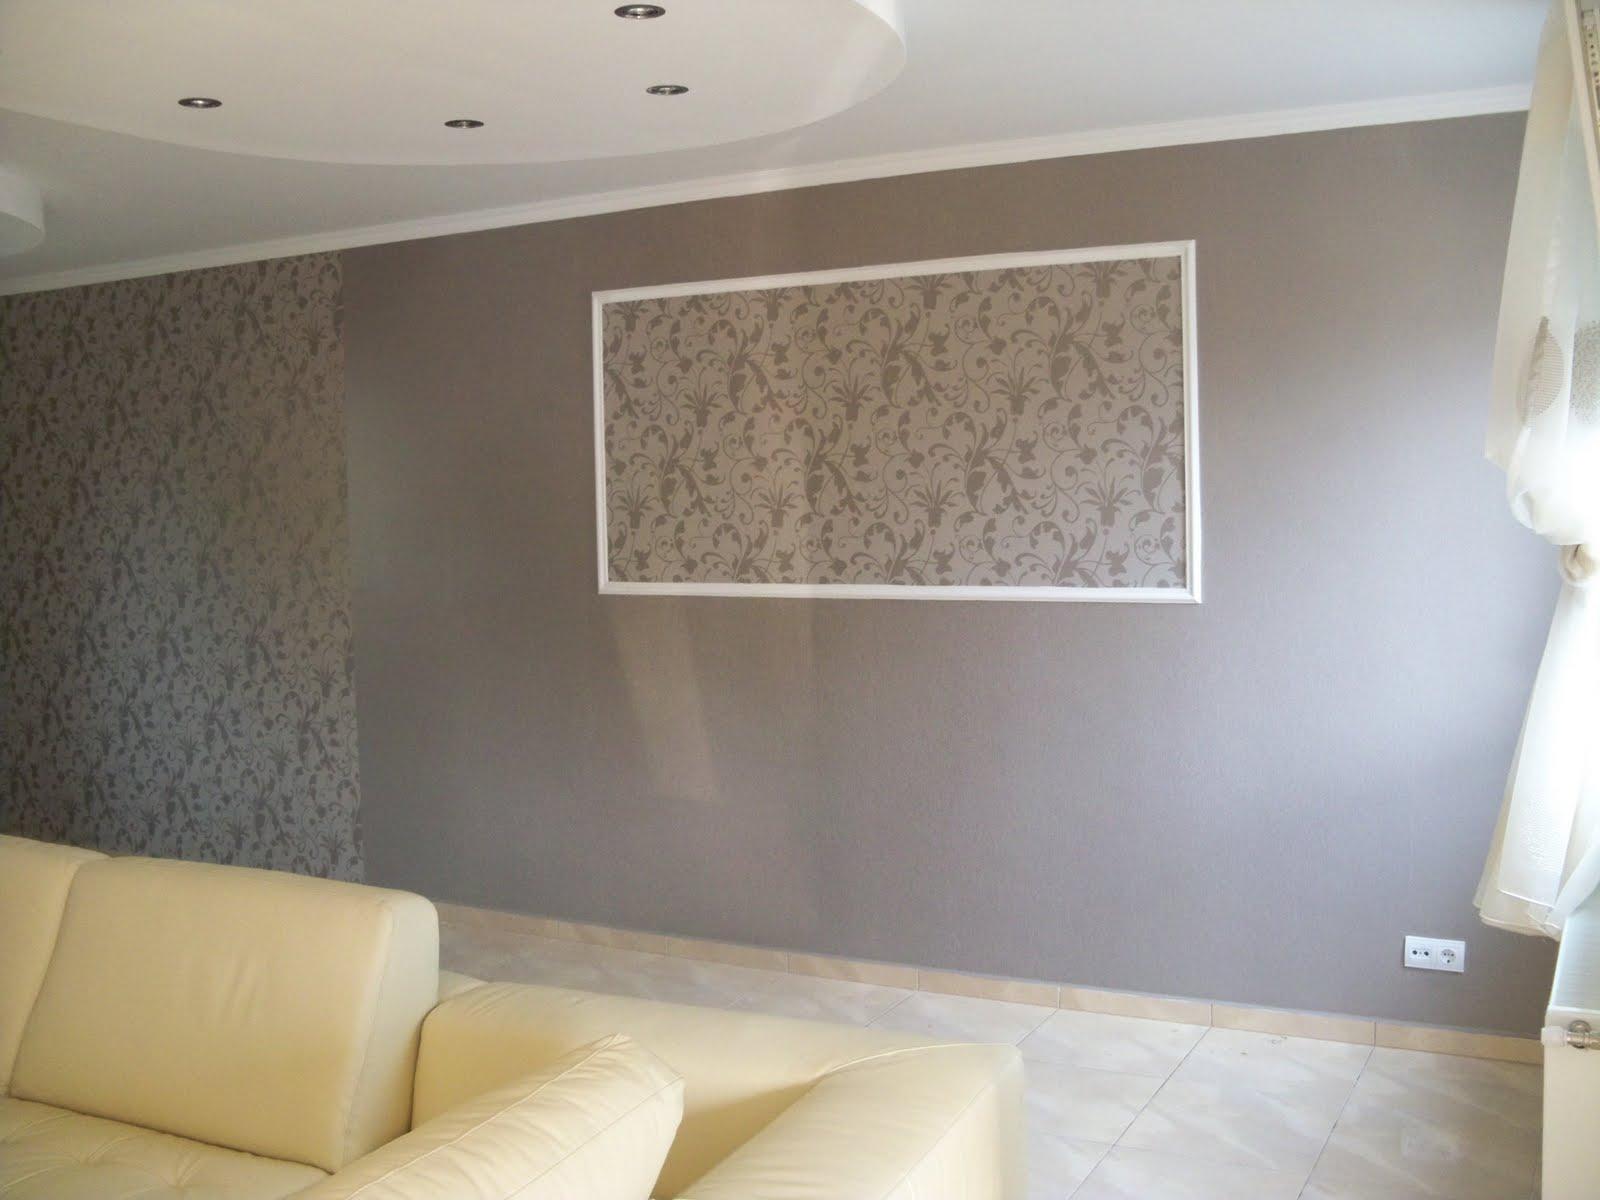 Profi Dekor: Vision Wallcoverings (tapéta) ragasztása